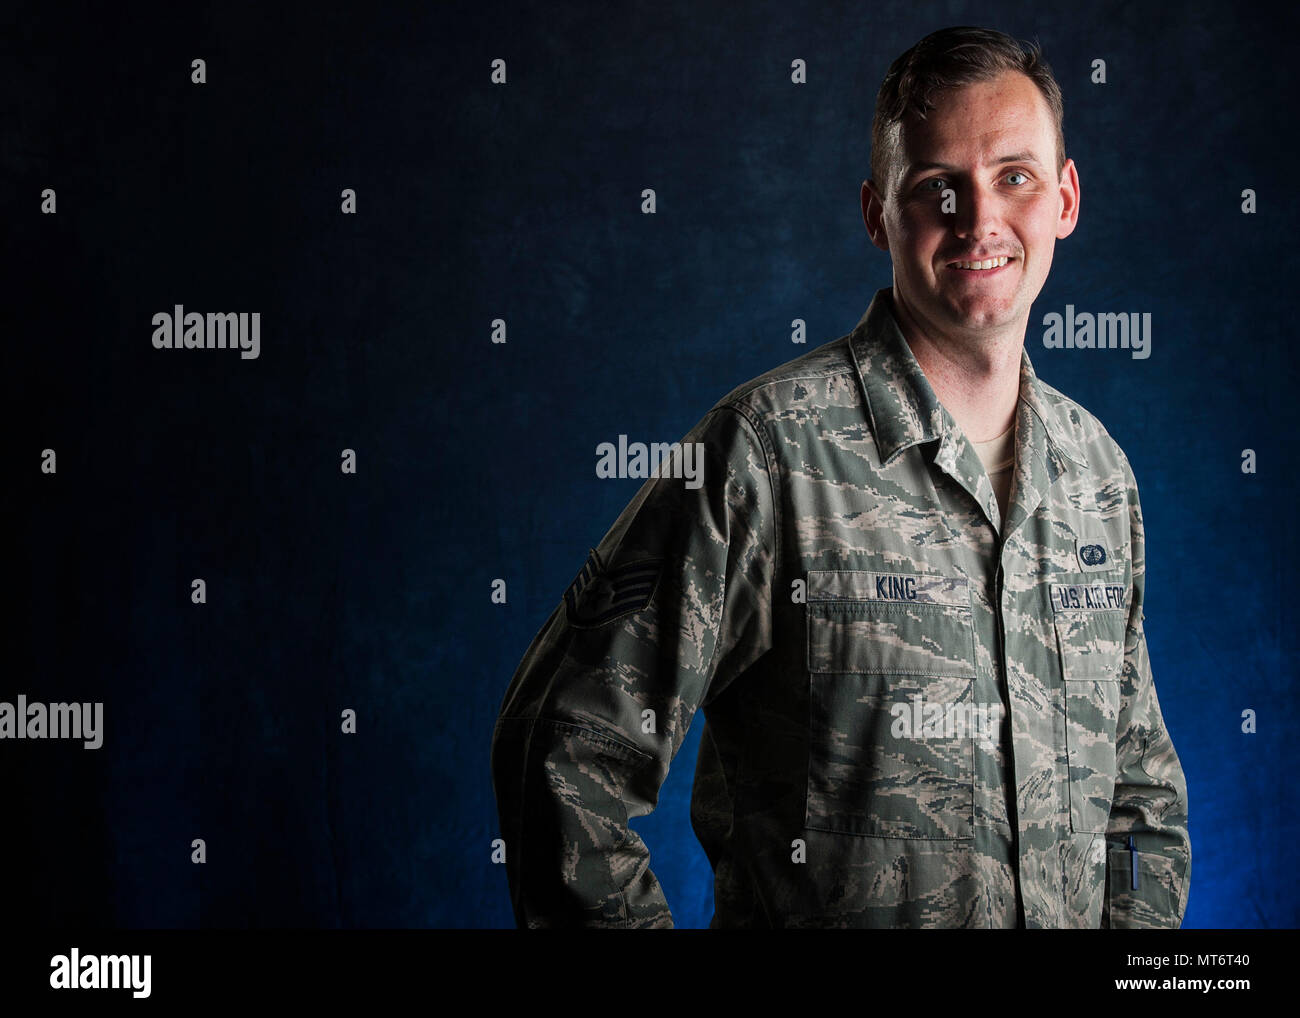 airman dating nco